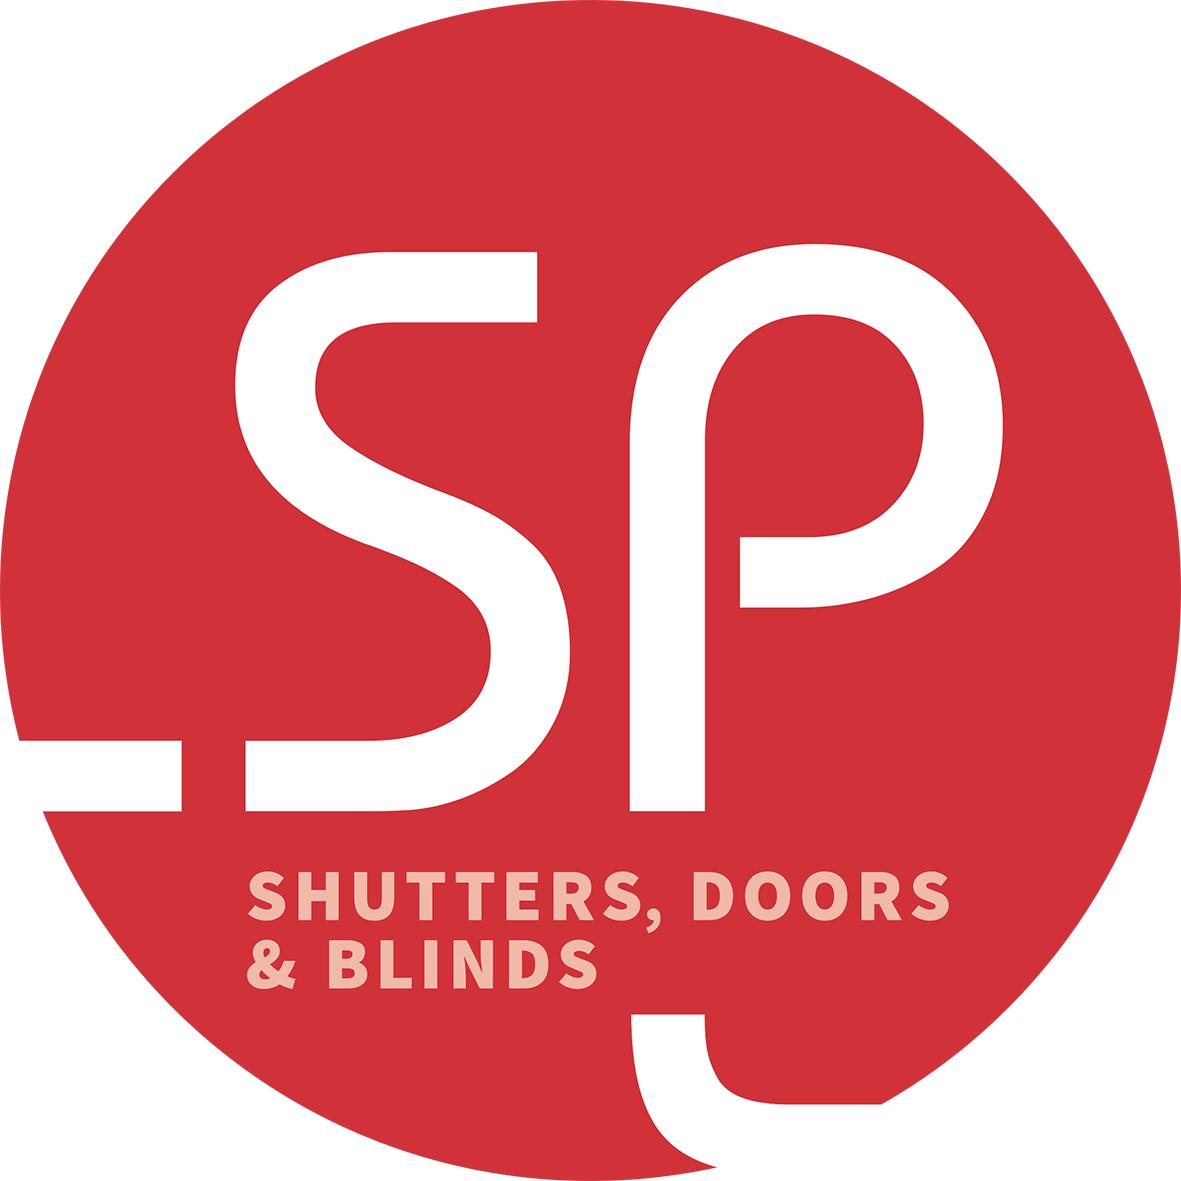 Spshutters_logo